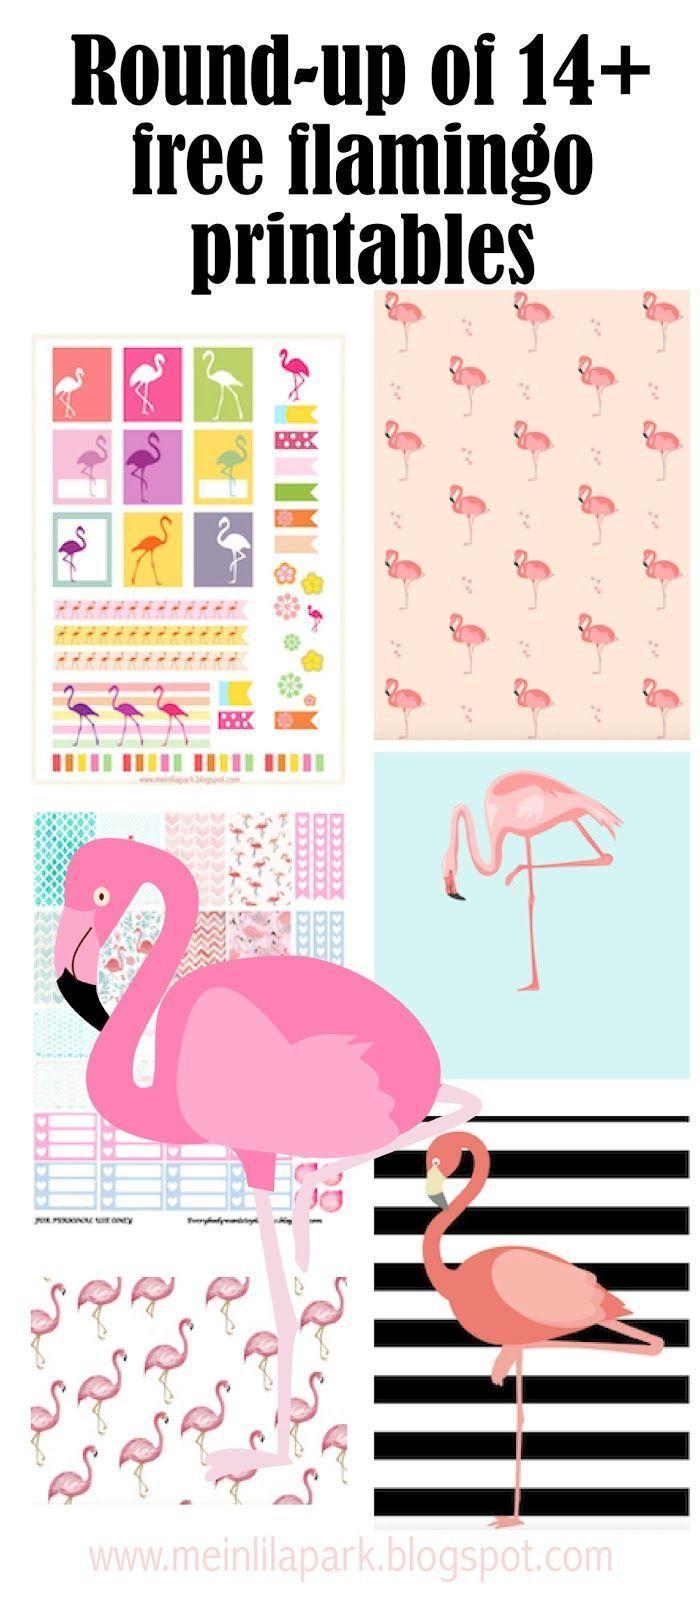 FREE printable flamingo printables - round-up